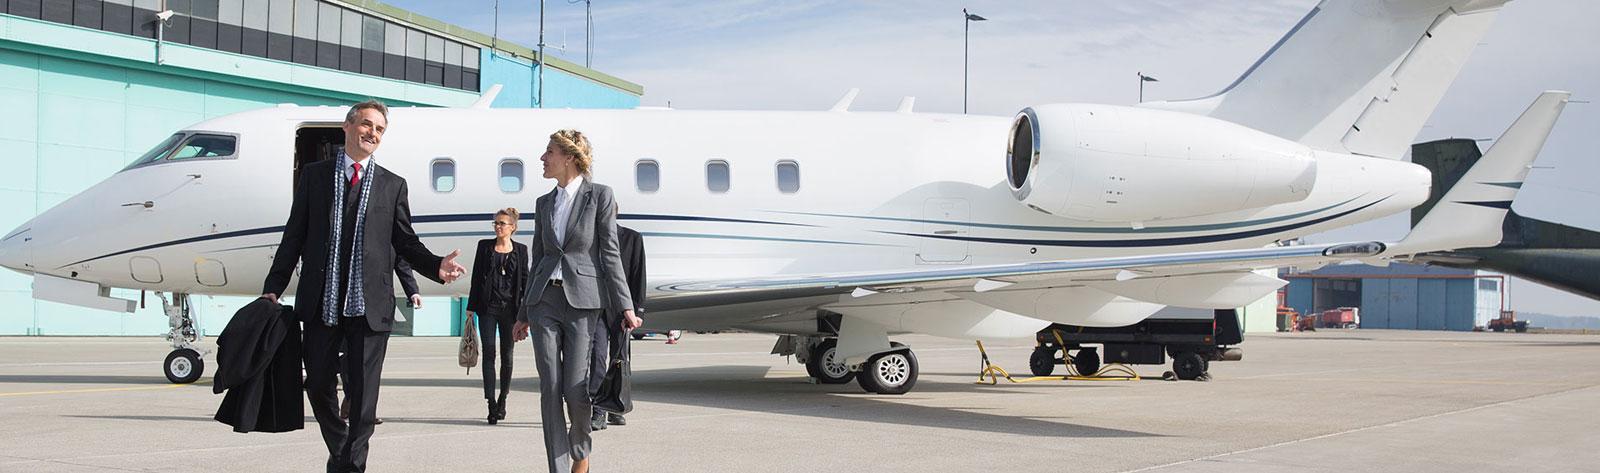 Belvedere Airport Transportation Limo Service